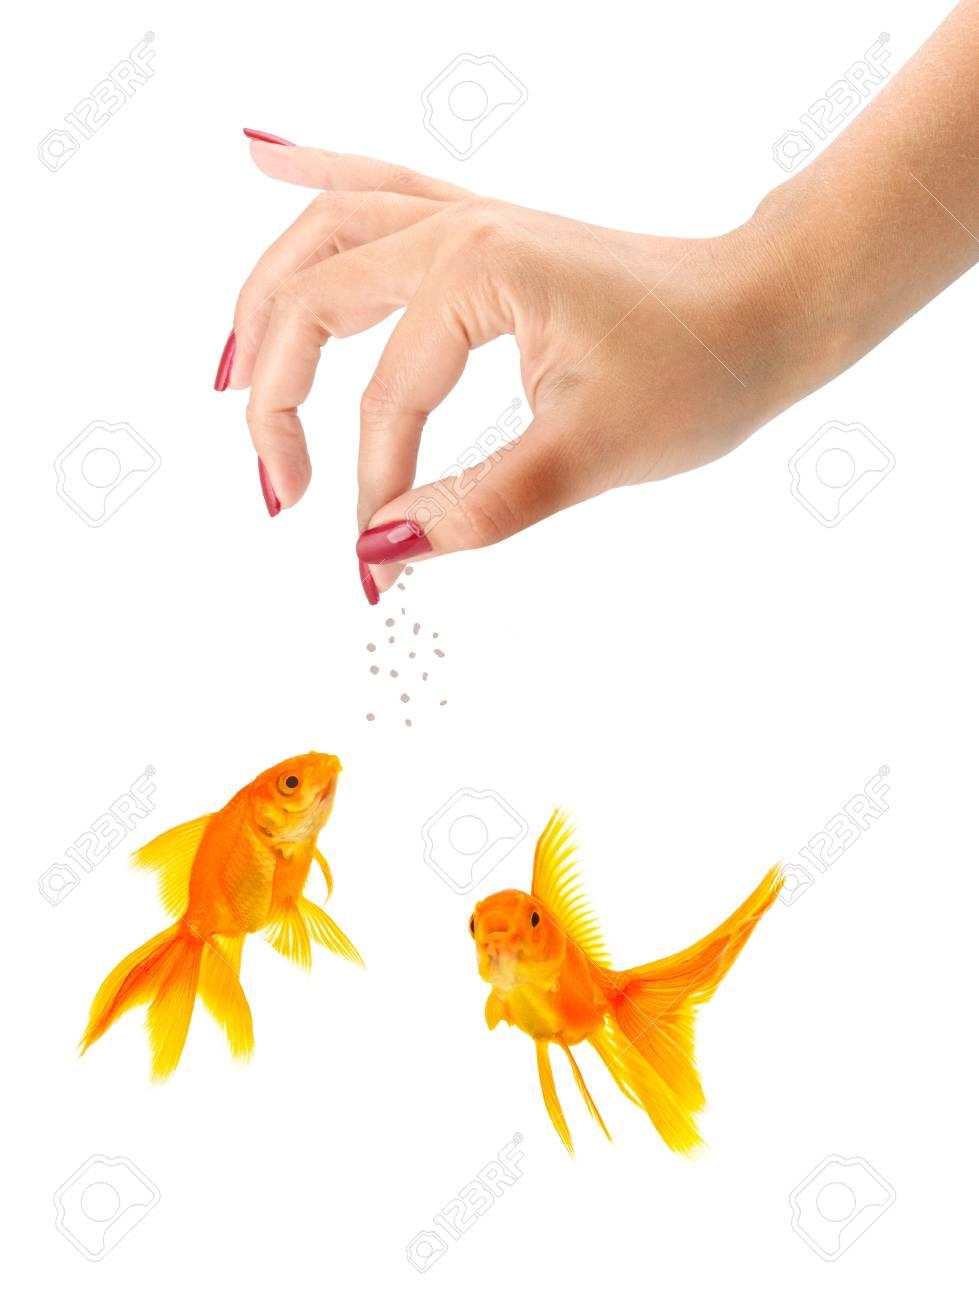 Woman feeding goldfishes isolated on a white background Stock Photo - 7998299